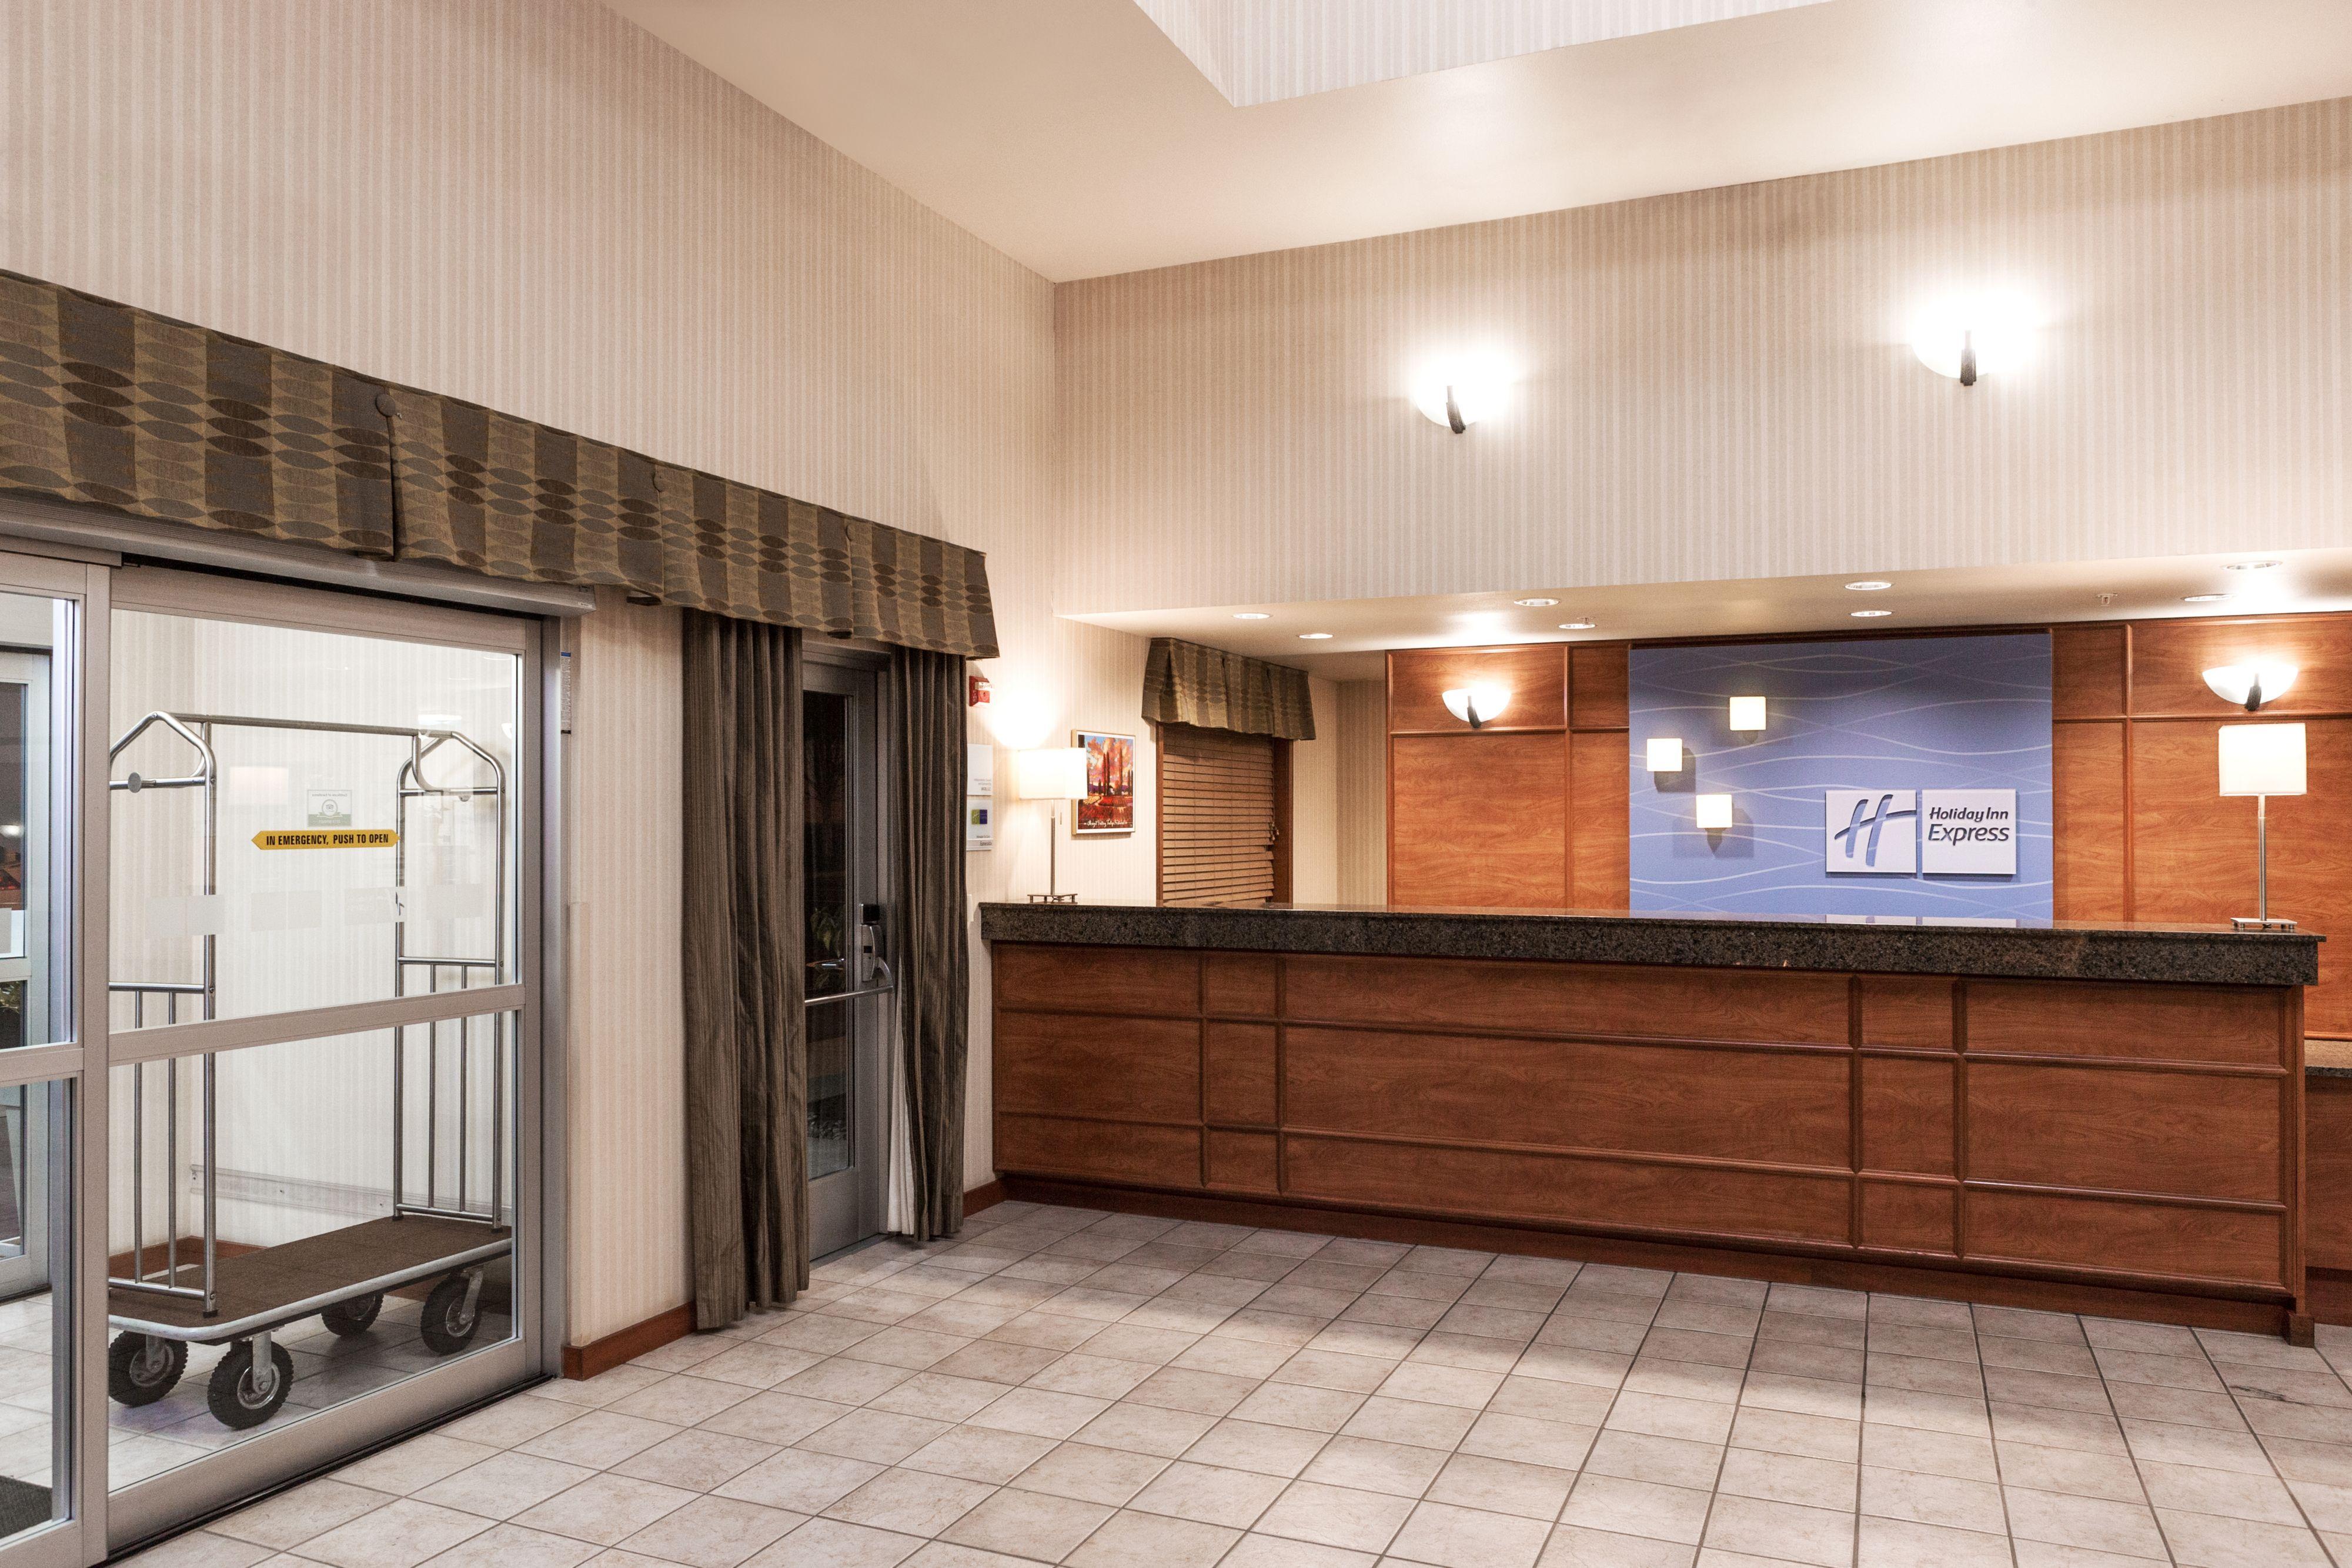 Holiday Inn Express & Suites Burlington image 8